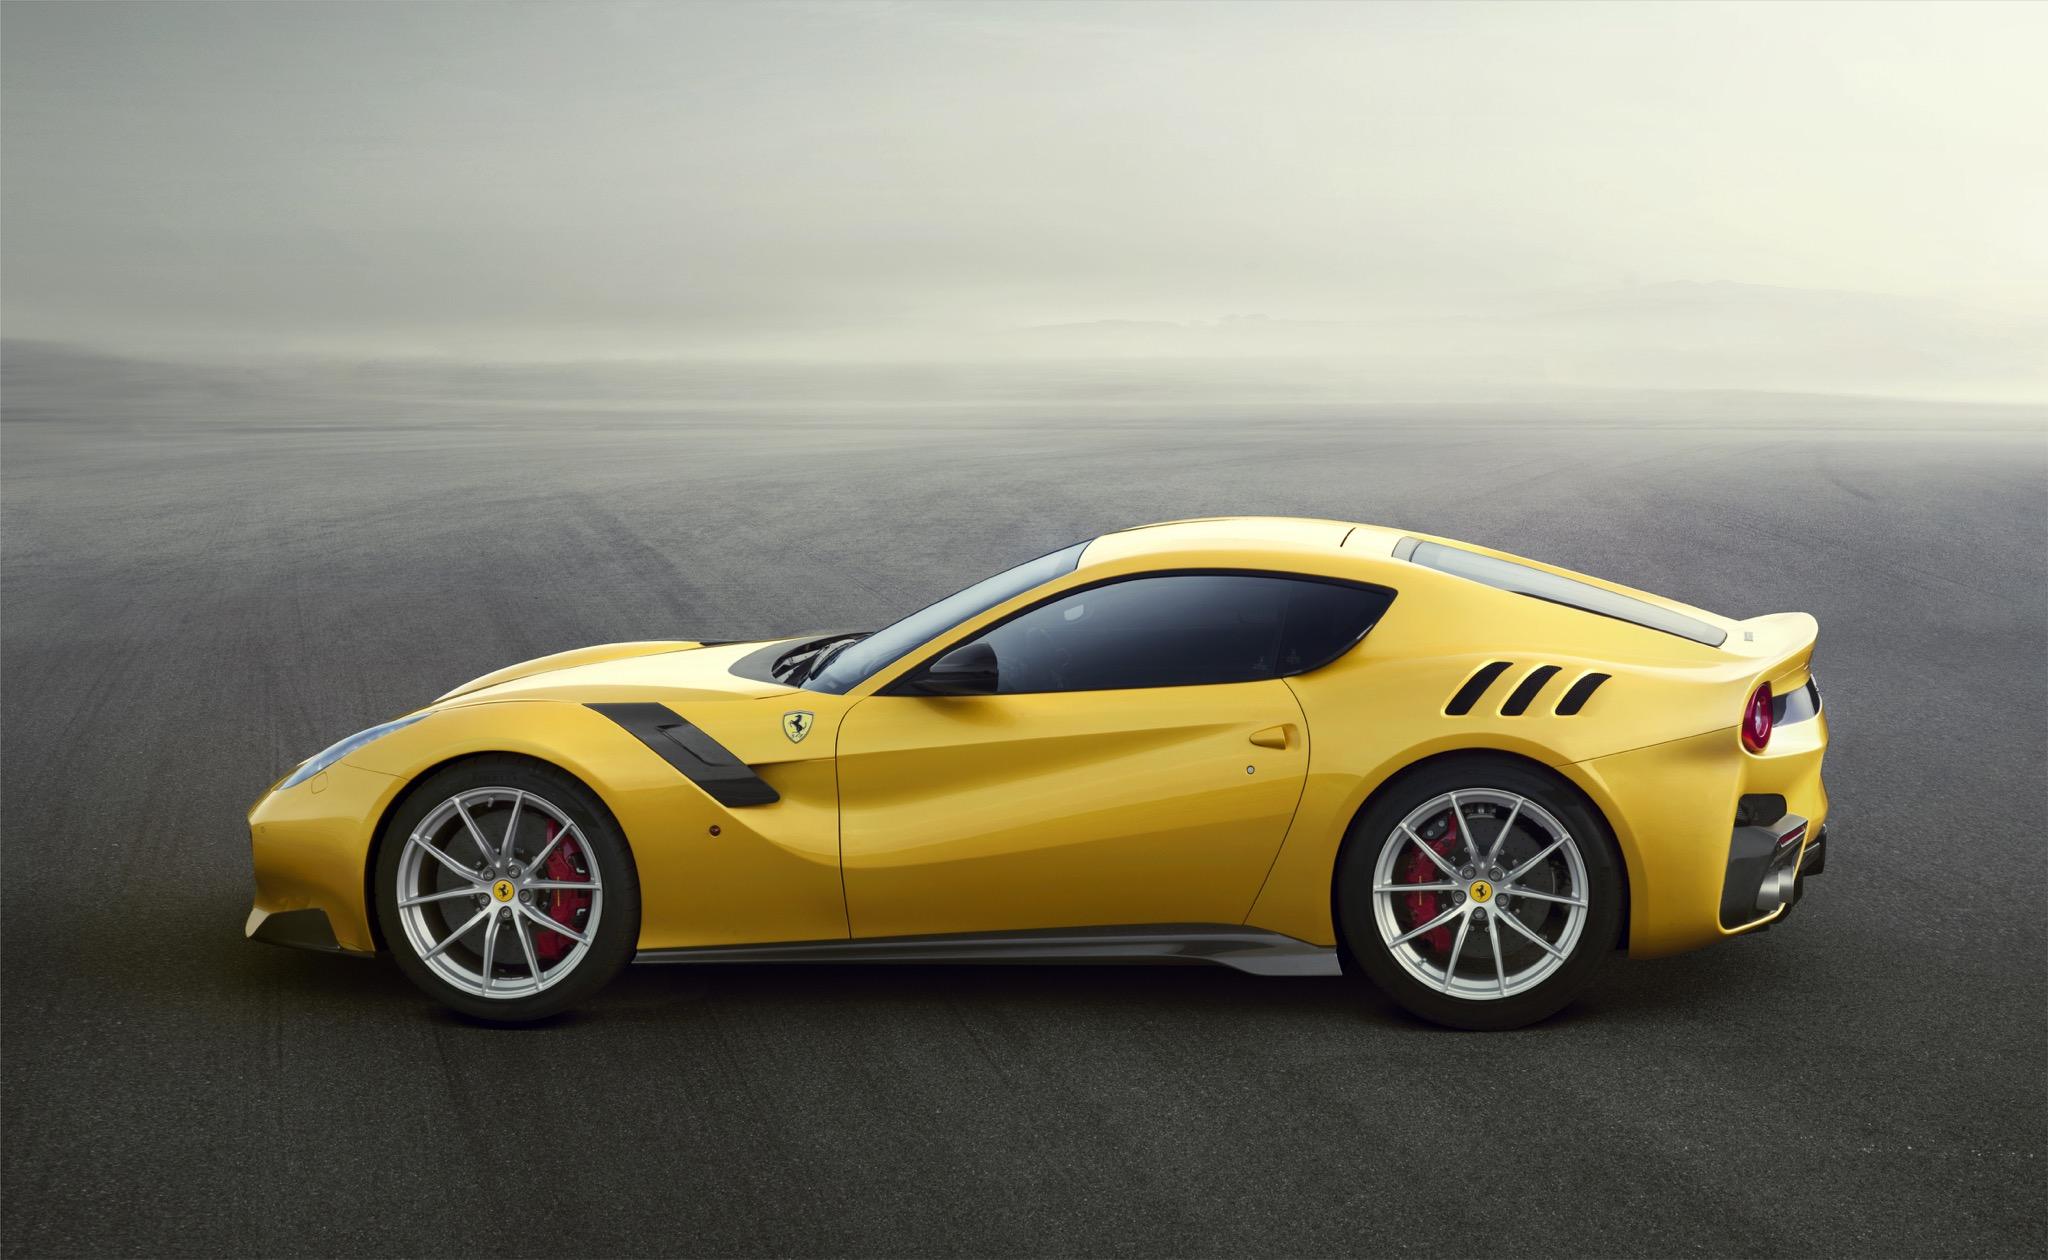 FerrariF12tdf 05